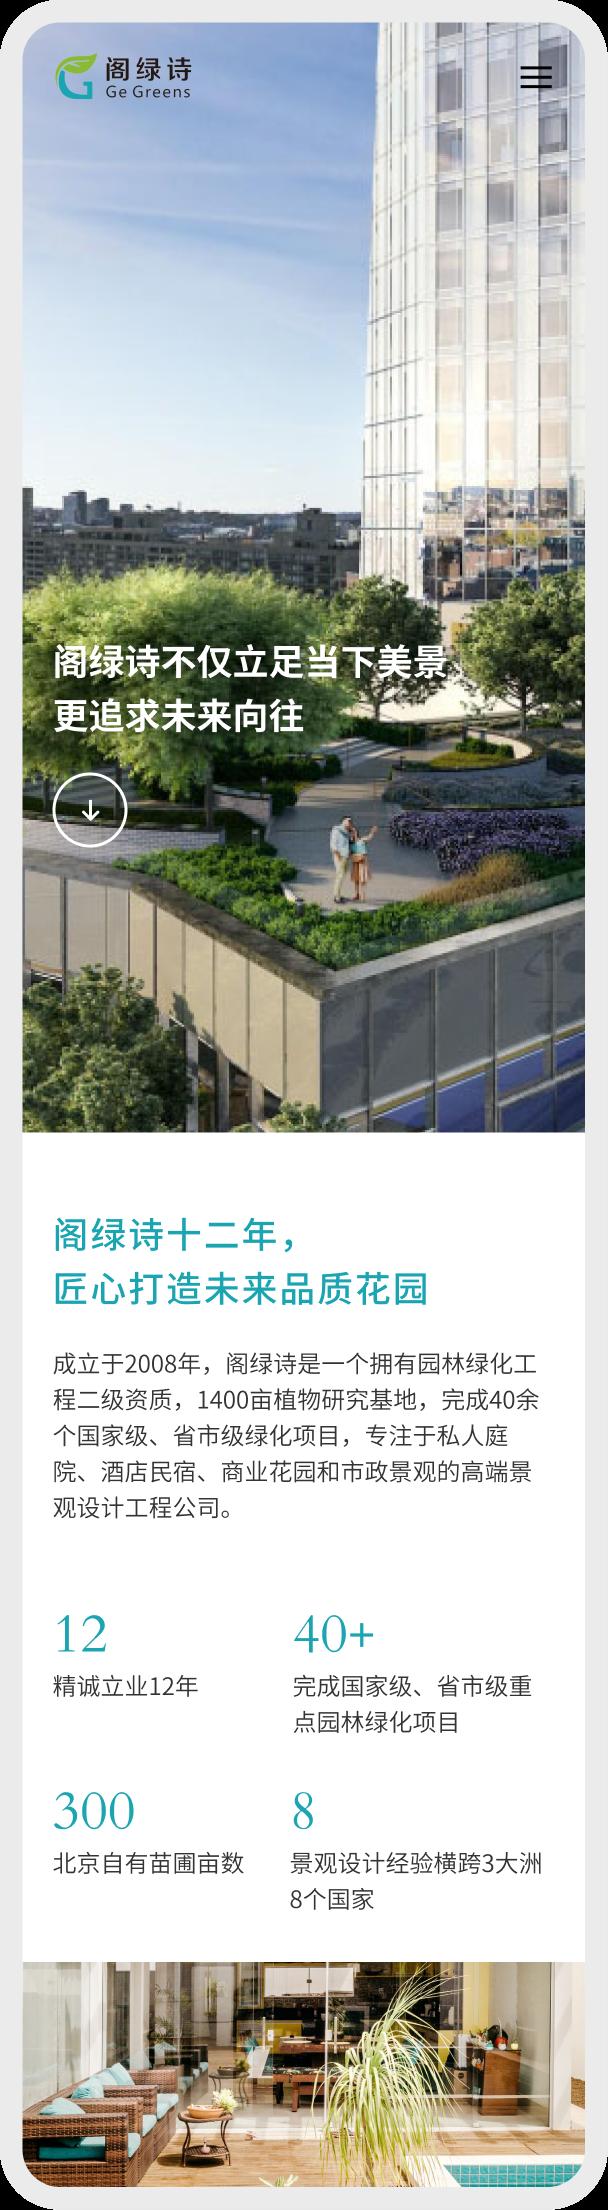 Ge Greens Homepage Mobile View